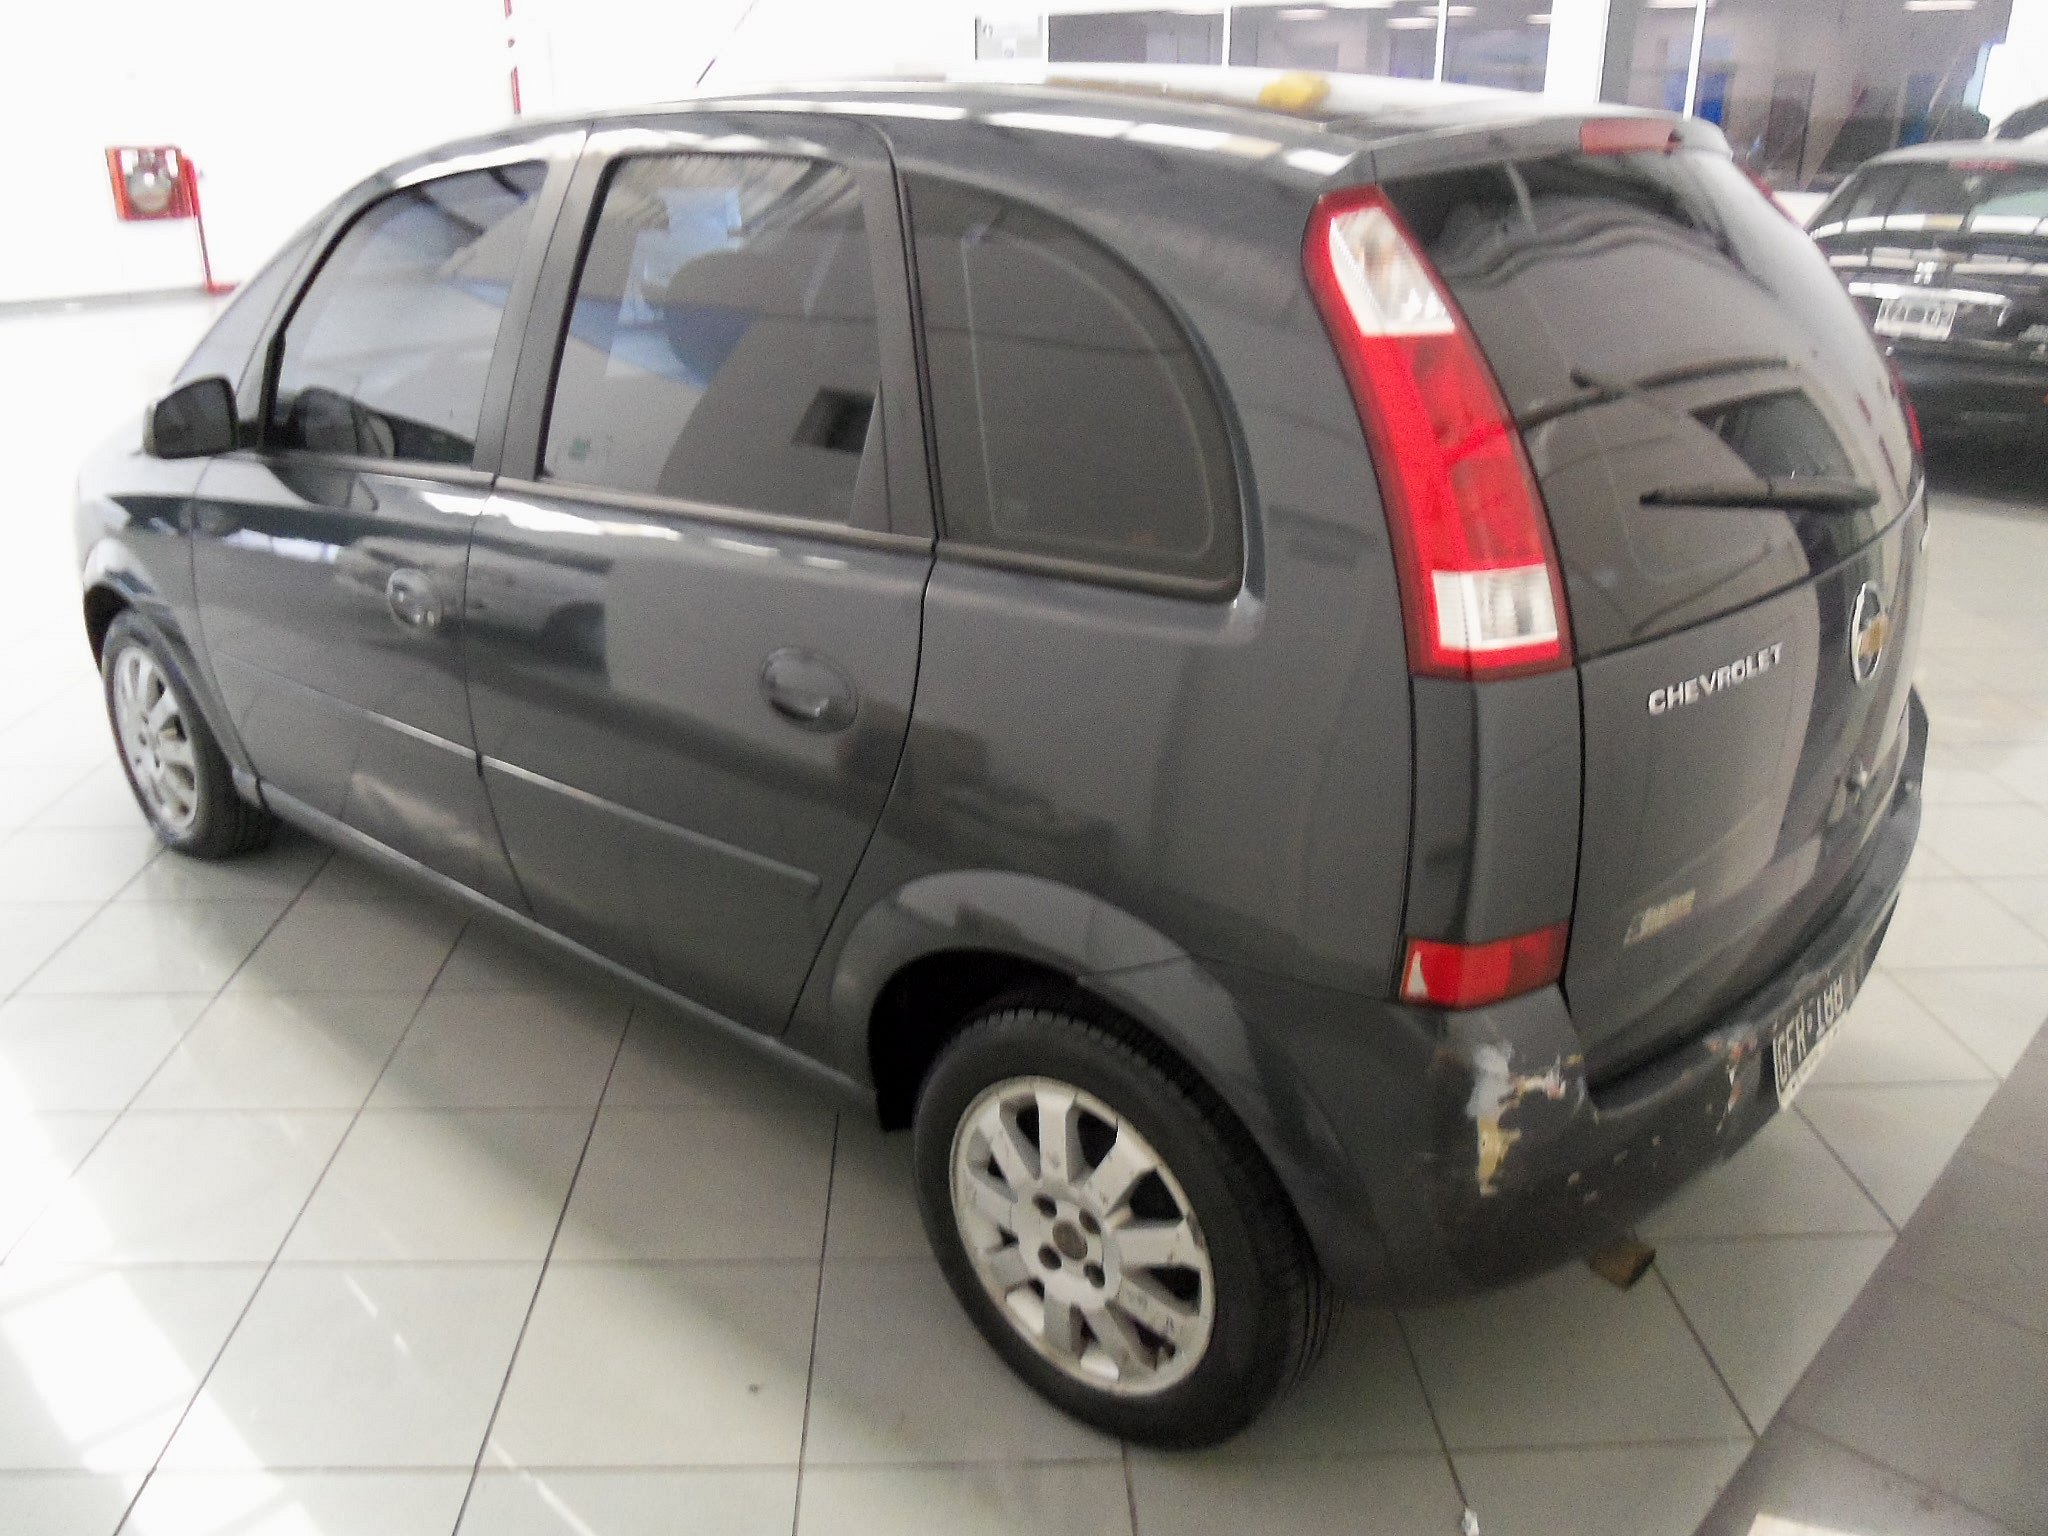 2007 Chevrolet Meriva GLS 1,8L